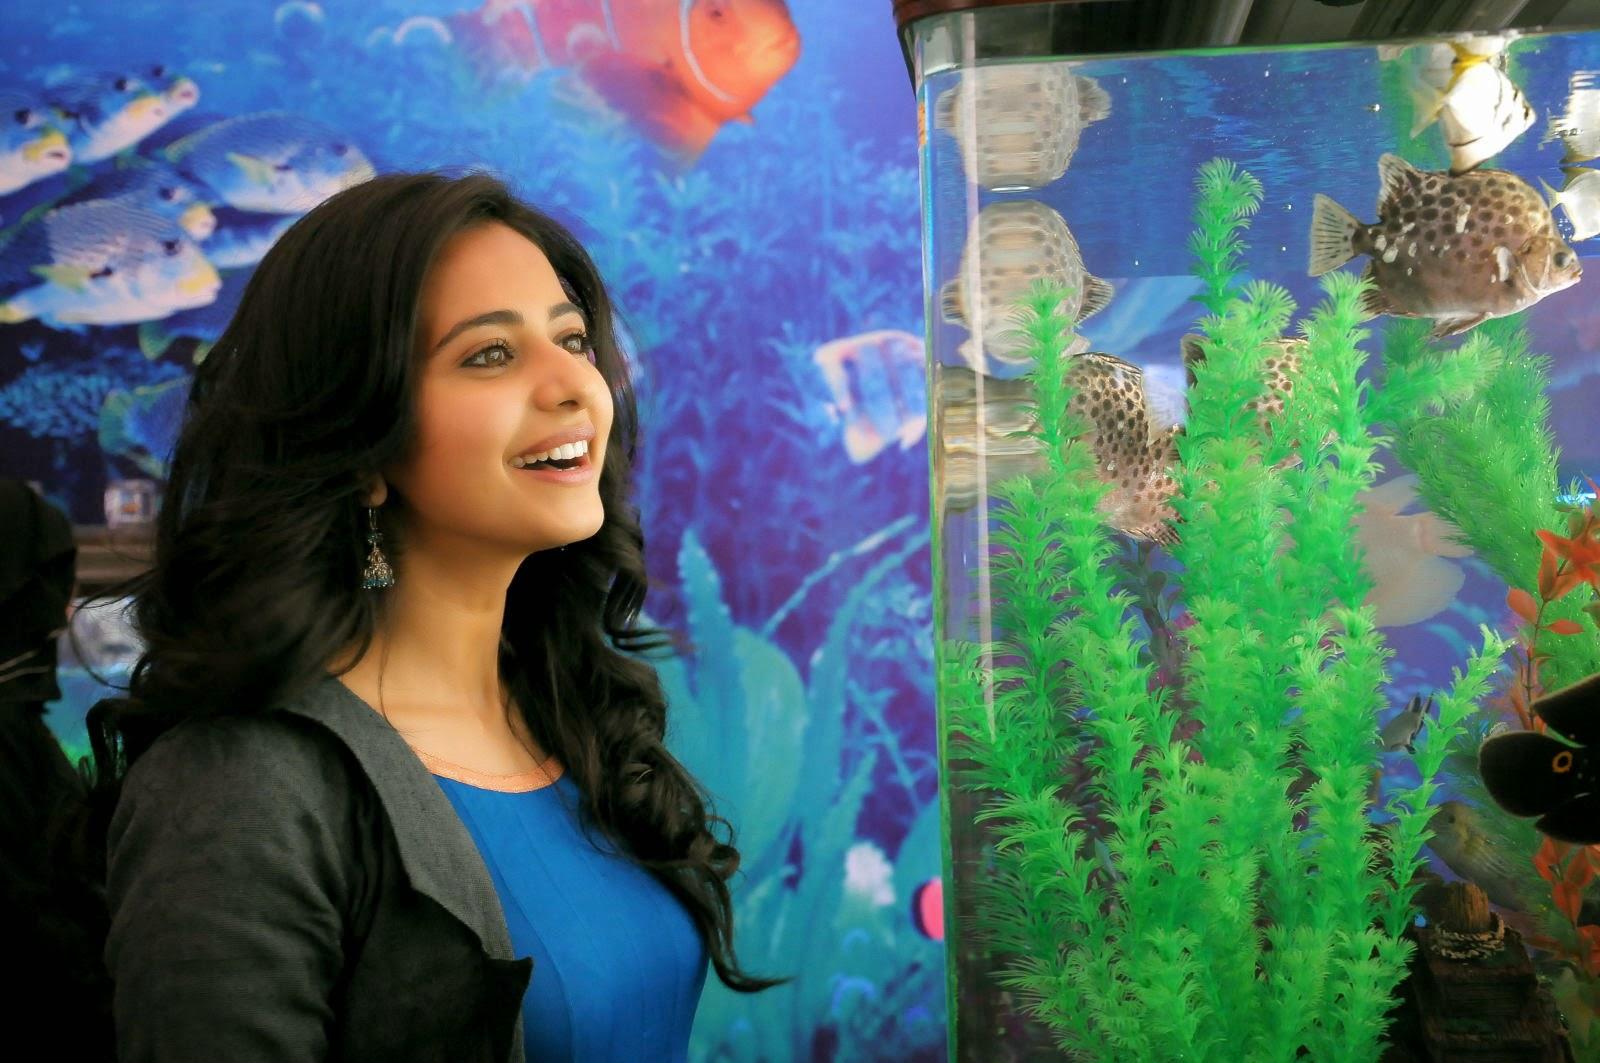 South Indian Spicy Girl Rakul Preet Singh Smiling Face Stills In Black Dress